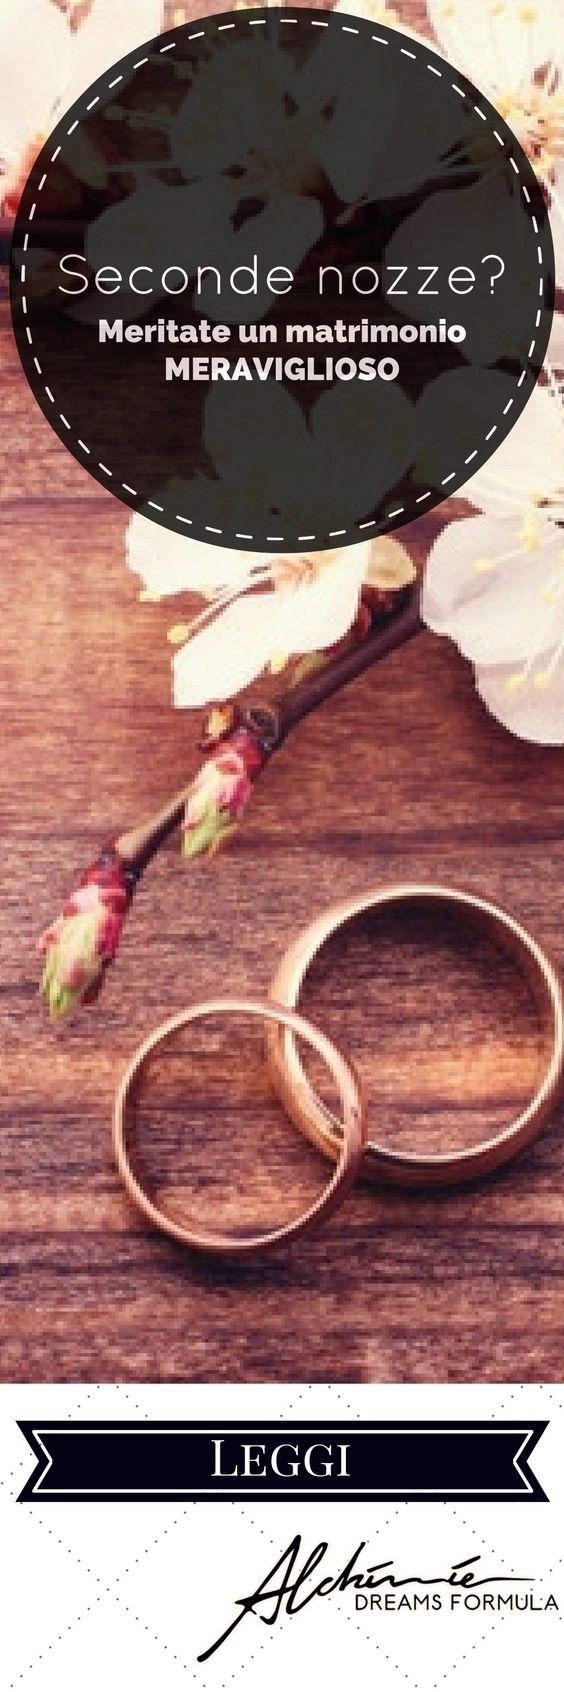 Seconde nozze? Meritate un matrimonio meraviglioso! -  Remarriage ? You deserve a wonderful wedding !